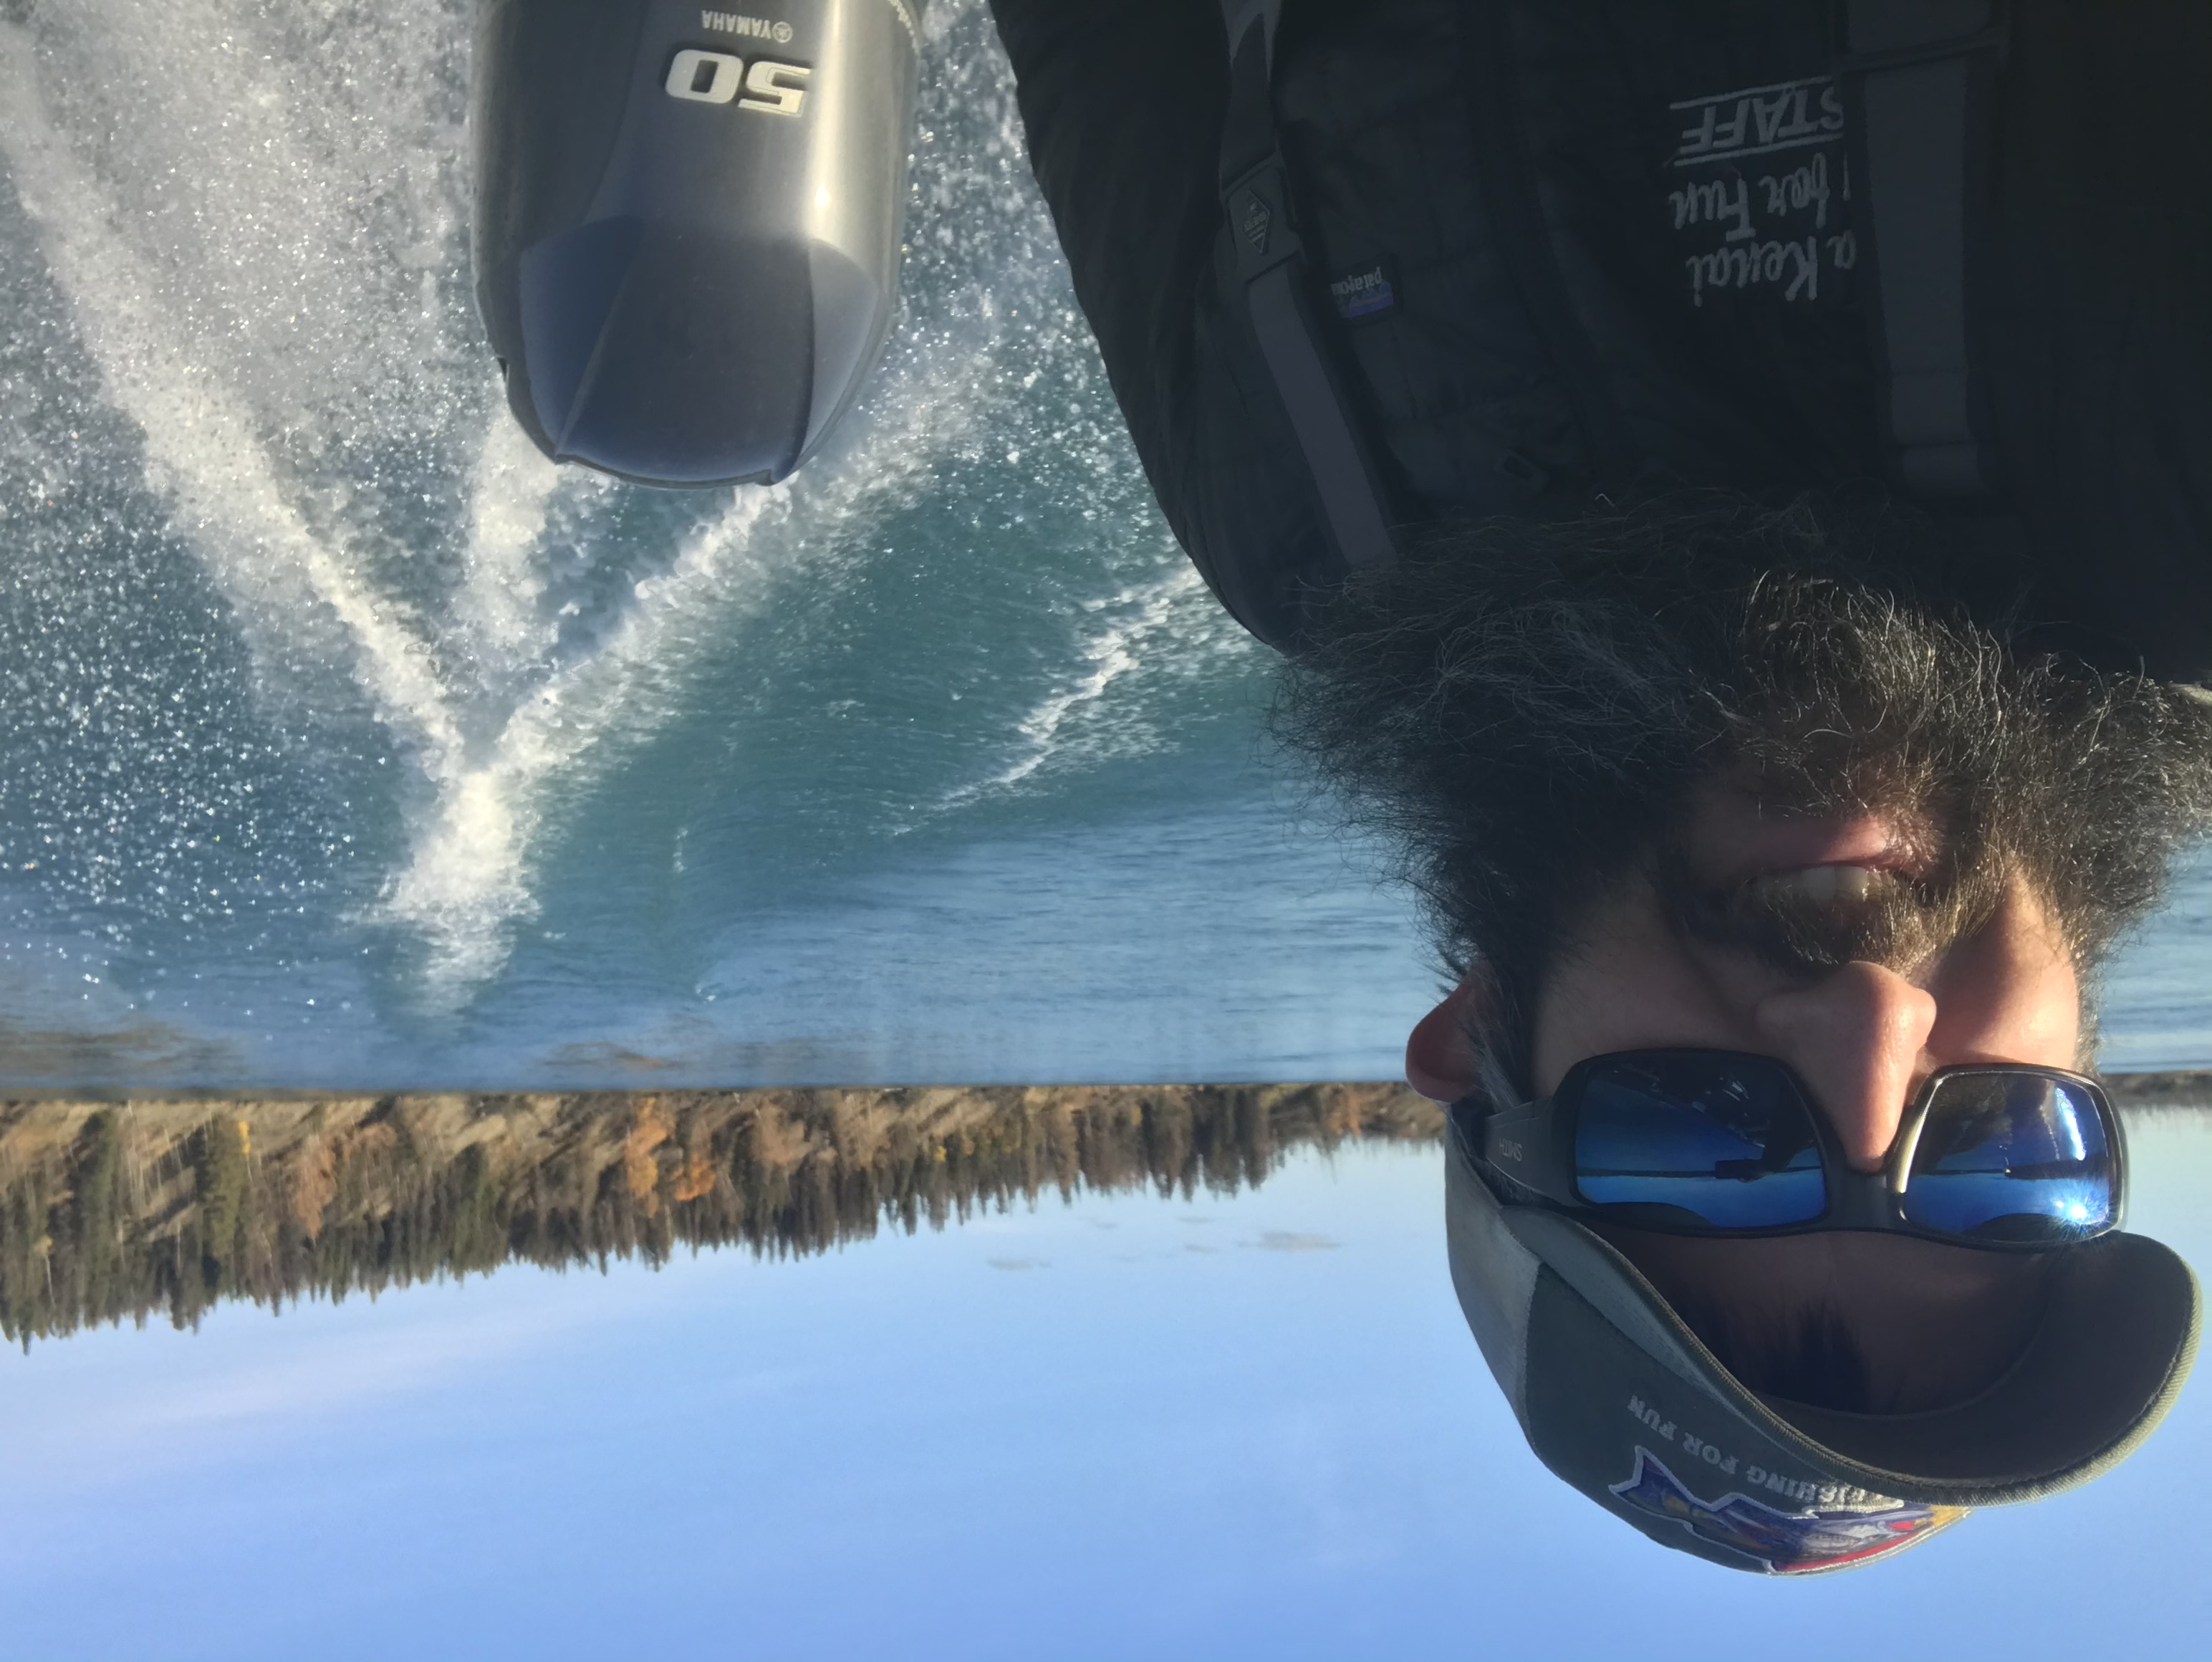 Brad Kirr Kenai River Fishing Guide Willie Boats Yamaha